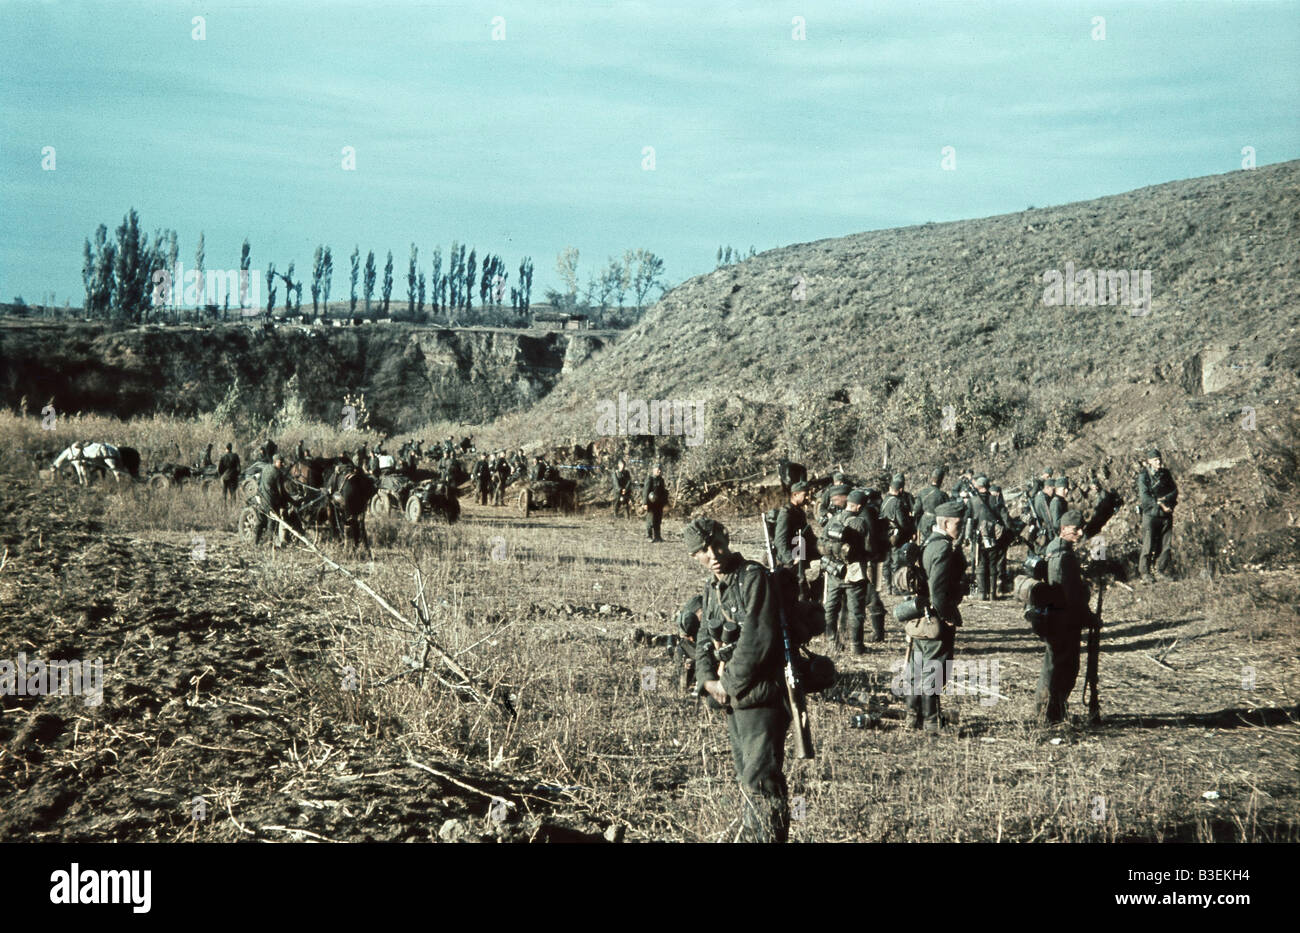 World War II/Stalingrad. - Stock Image